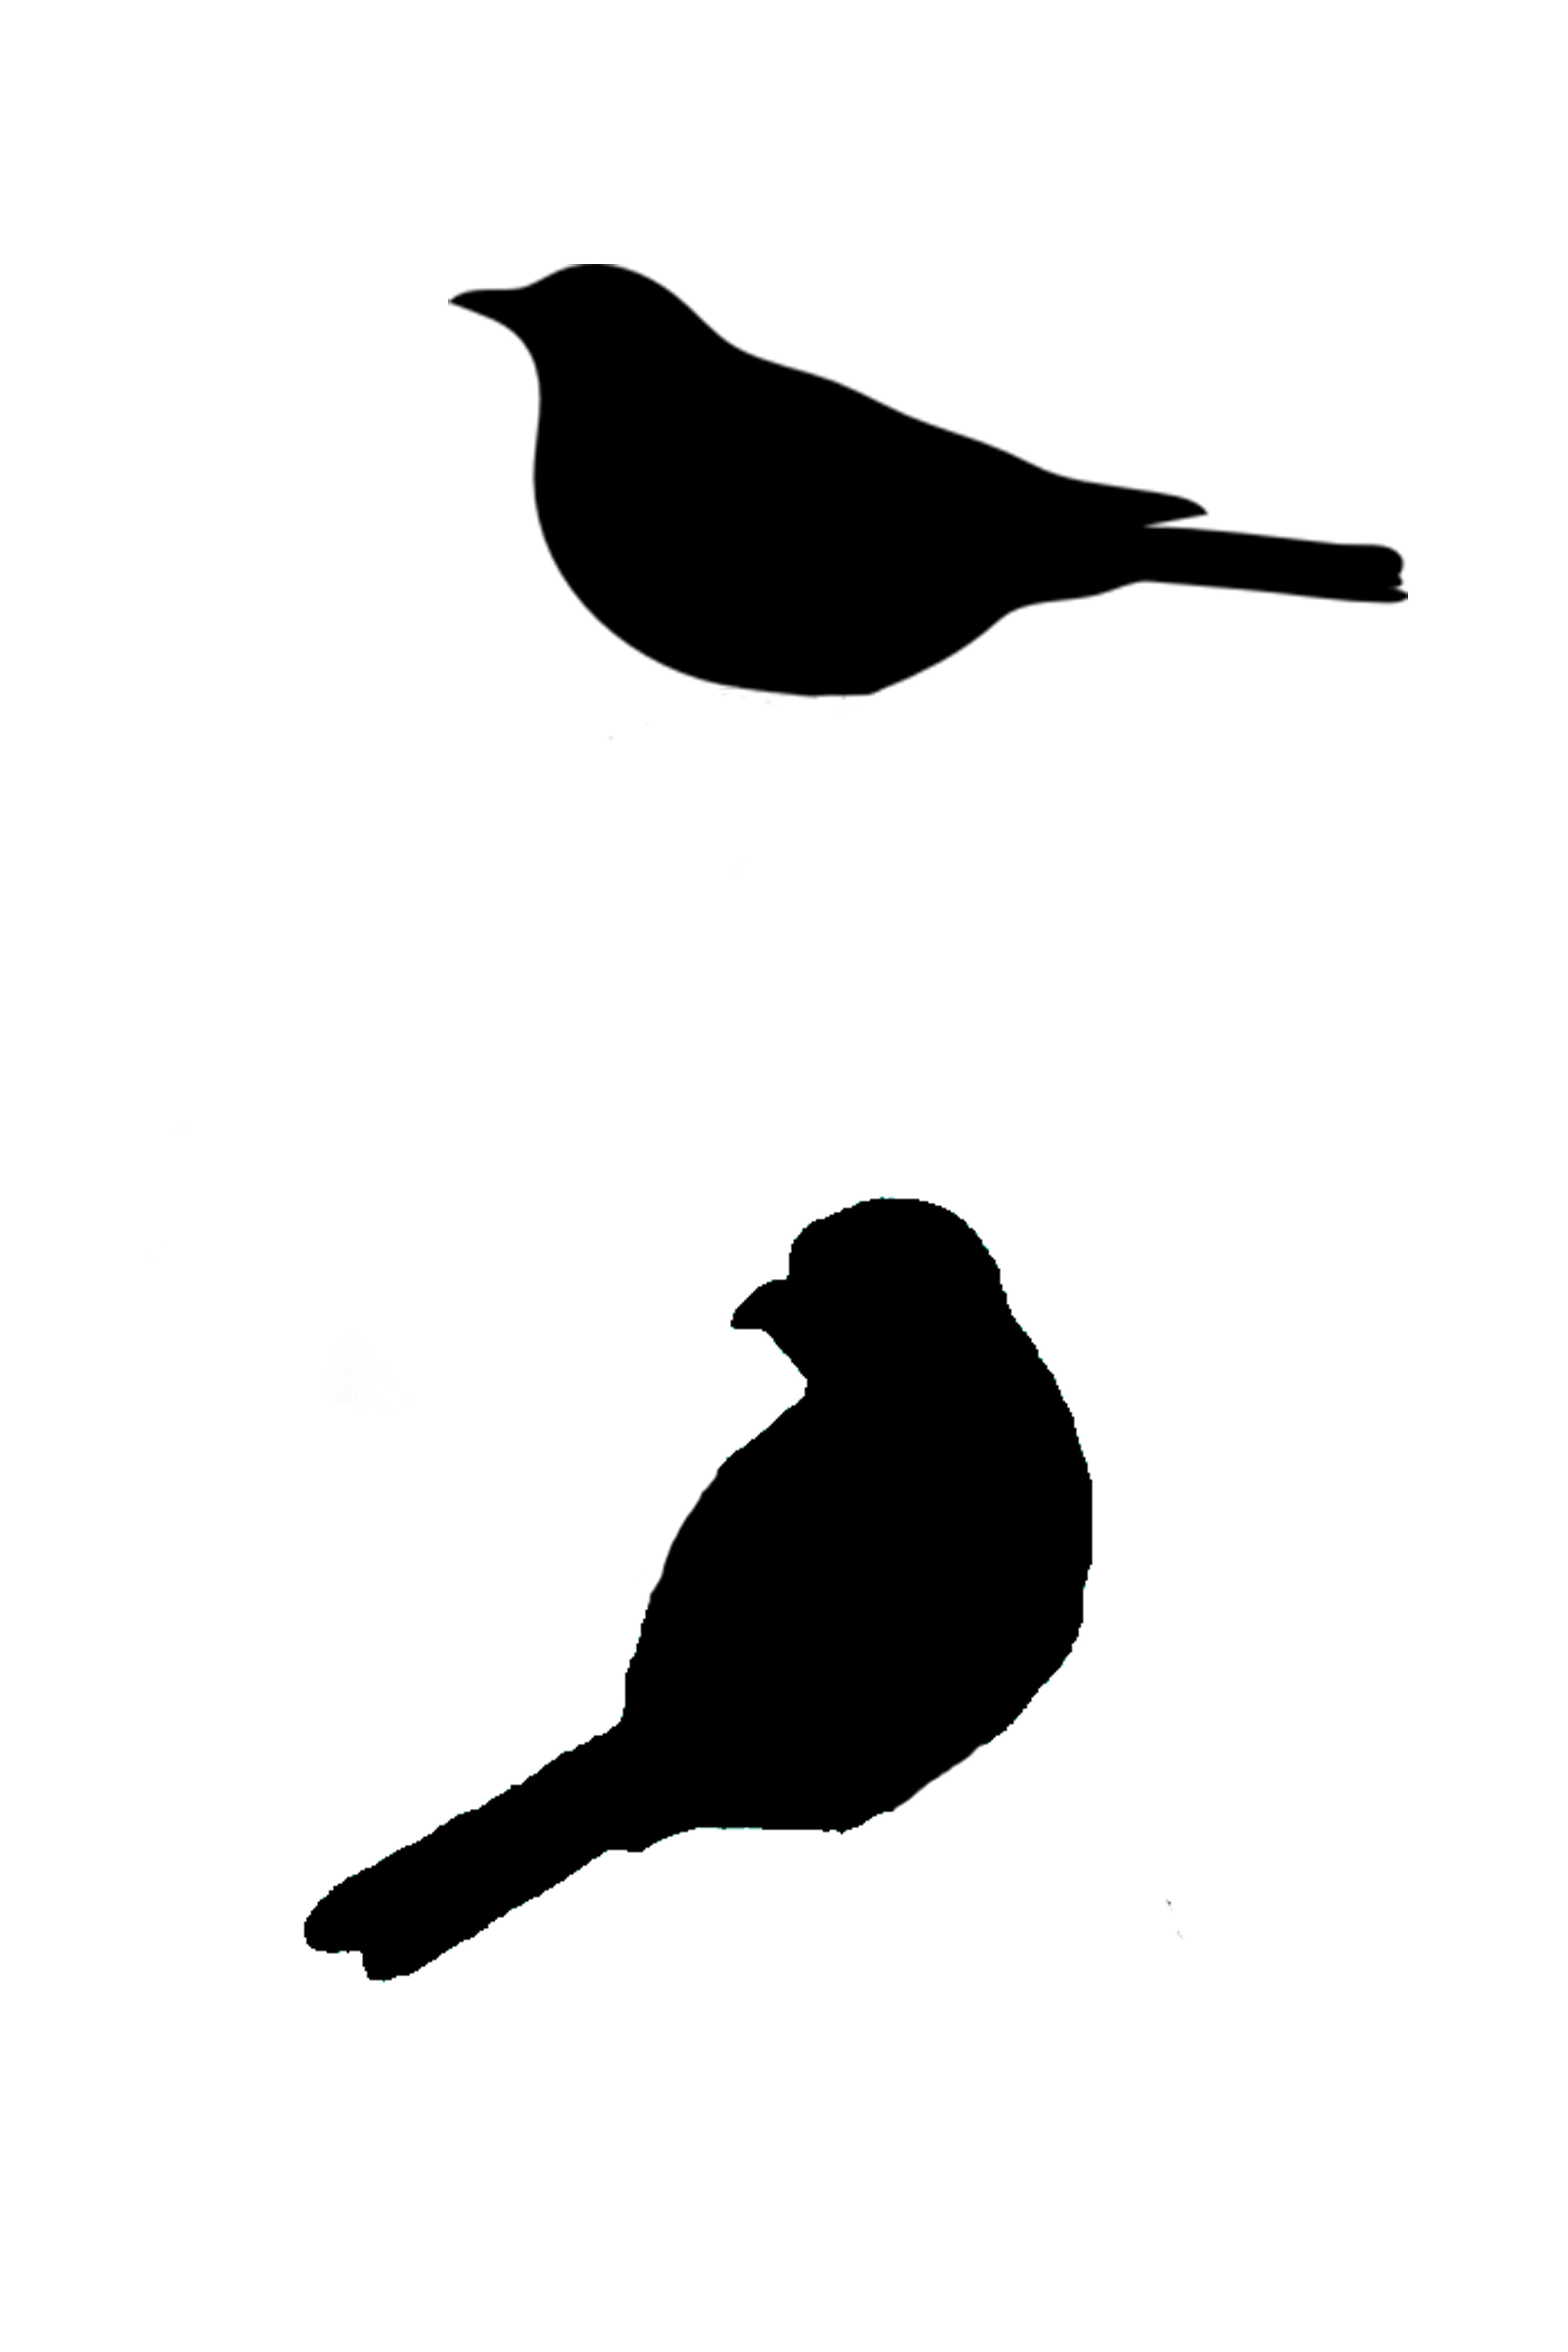 6096x9144 Sitting Bird Silhouette, Cut Out For Canvas Art ) Stencils